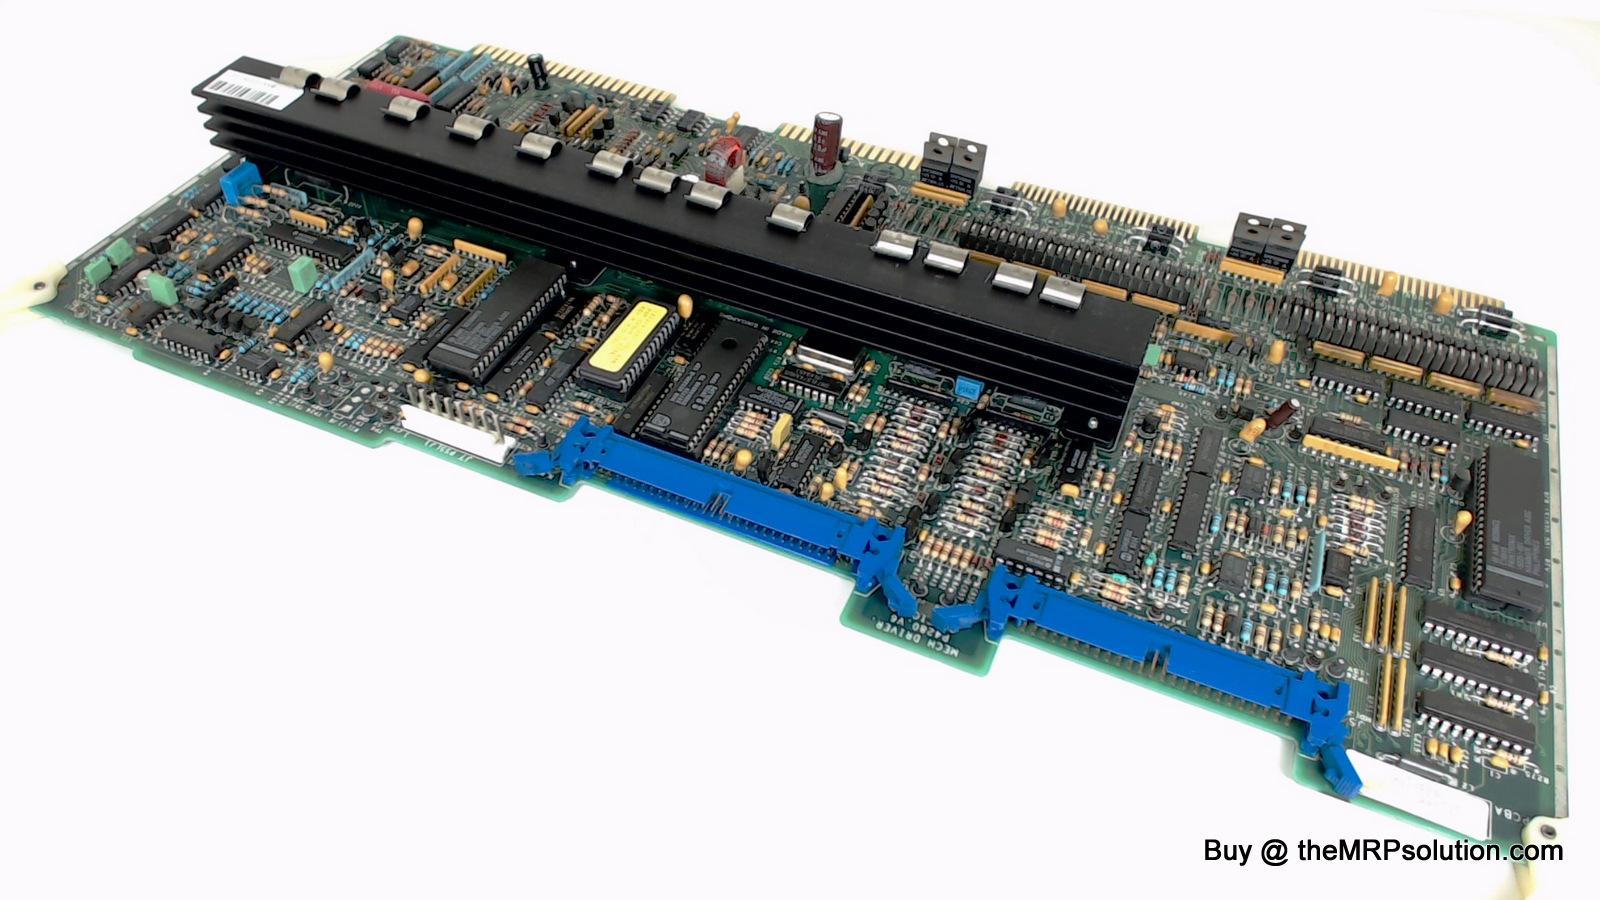 IBM 10R3922 MECH DRIVER, 6408 Refurbished